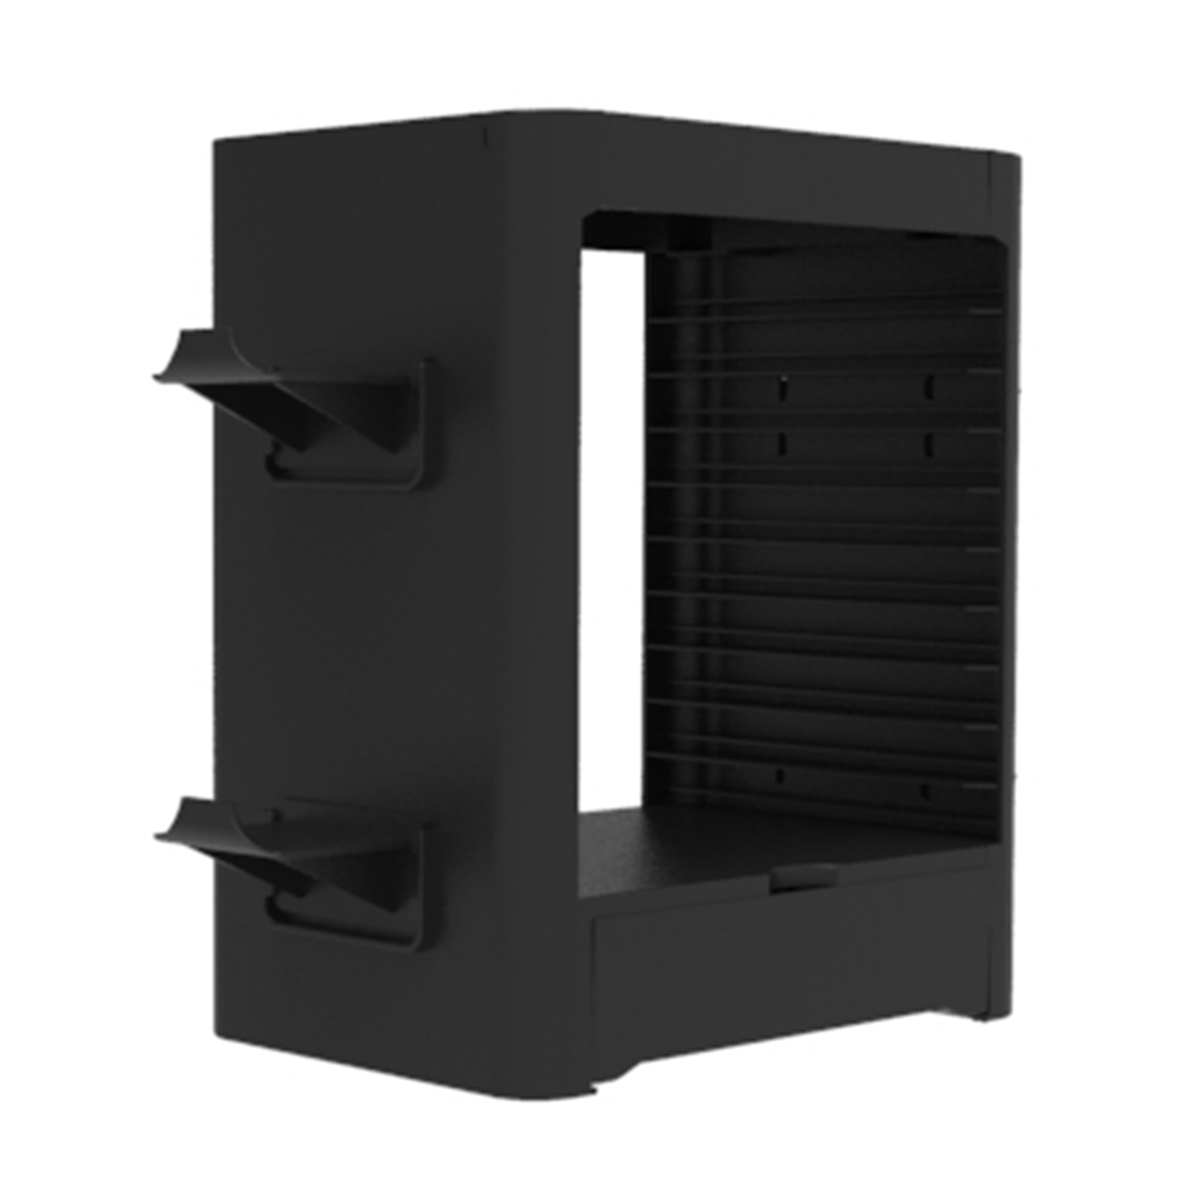 SnakeByte SONY PS5 ゲームスタンド GAMES:TOWER 5™ ゲームズ:タワー 5 コントローラーやソフトを収納